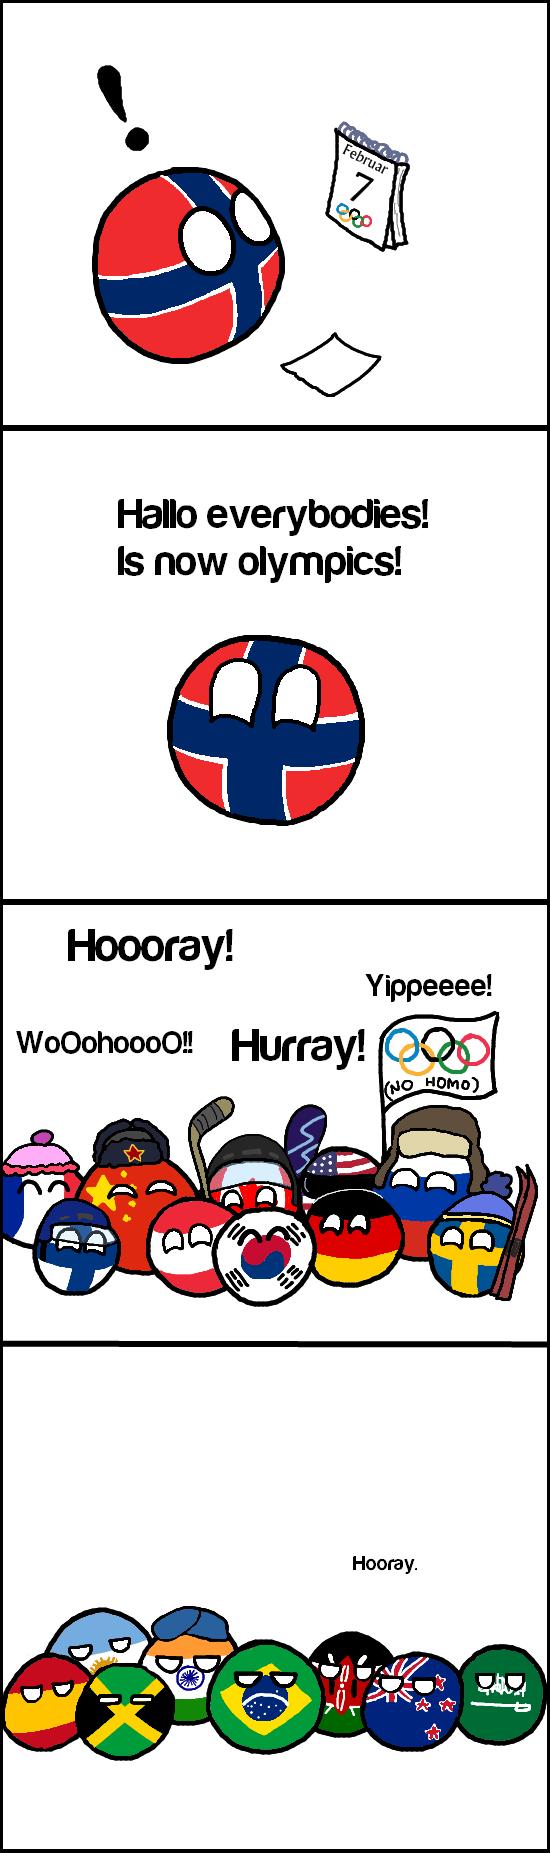 So it begins. r/polandball (disneyvillain) . Hallo ! Is now olympics! Hooraay! Hurray!. Some people, you know they can't believe! Jamaica, we have a bob-sled team! Olympics Polandball Sochi